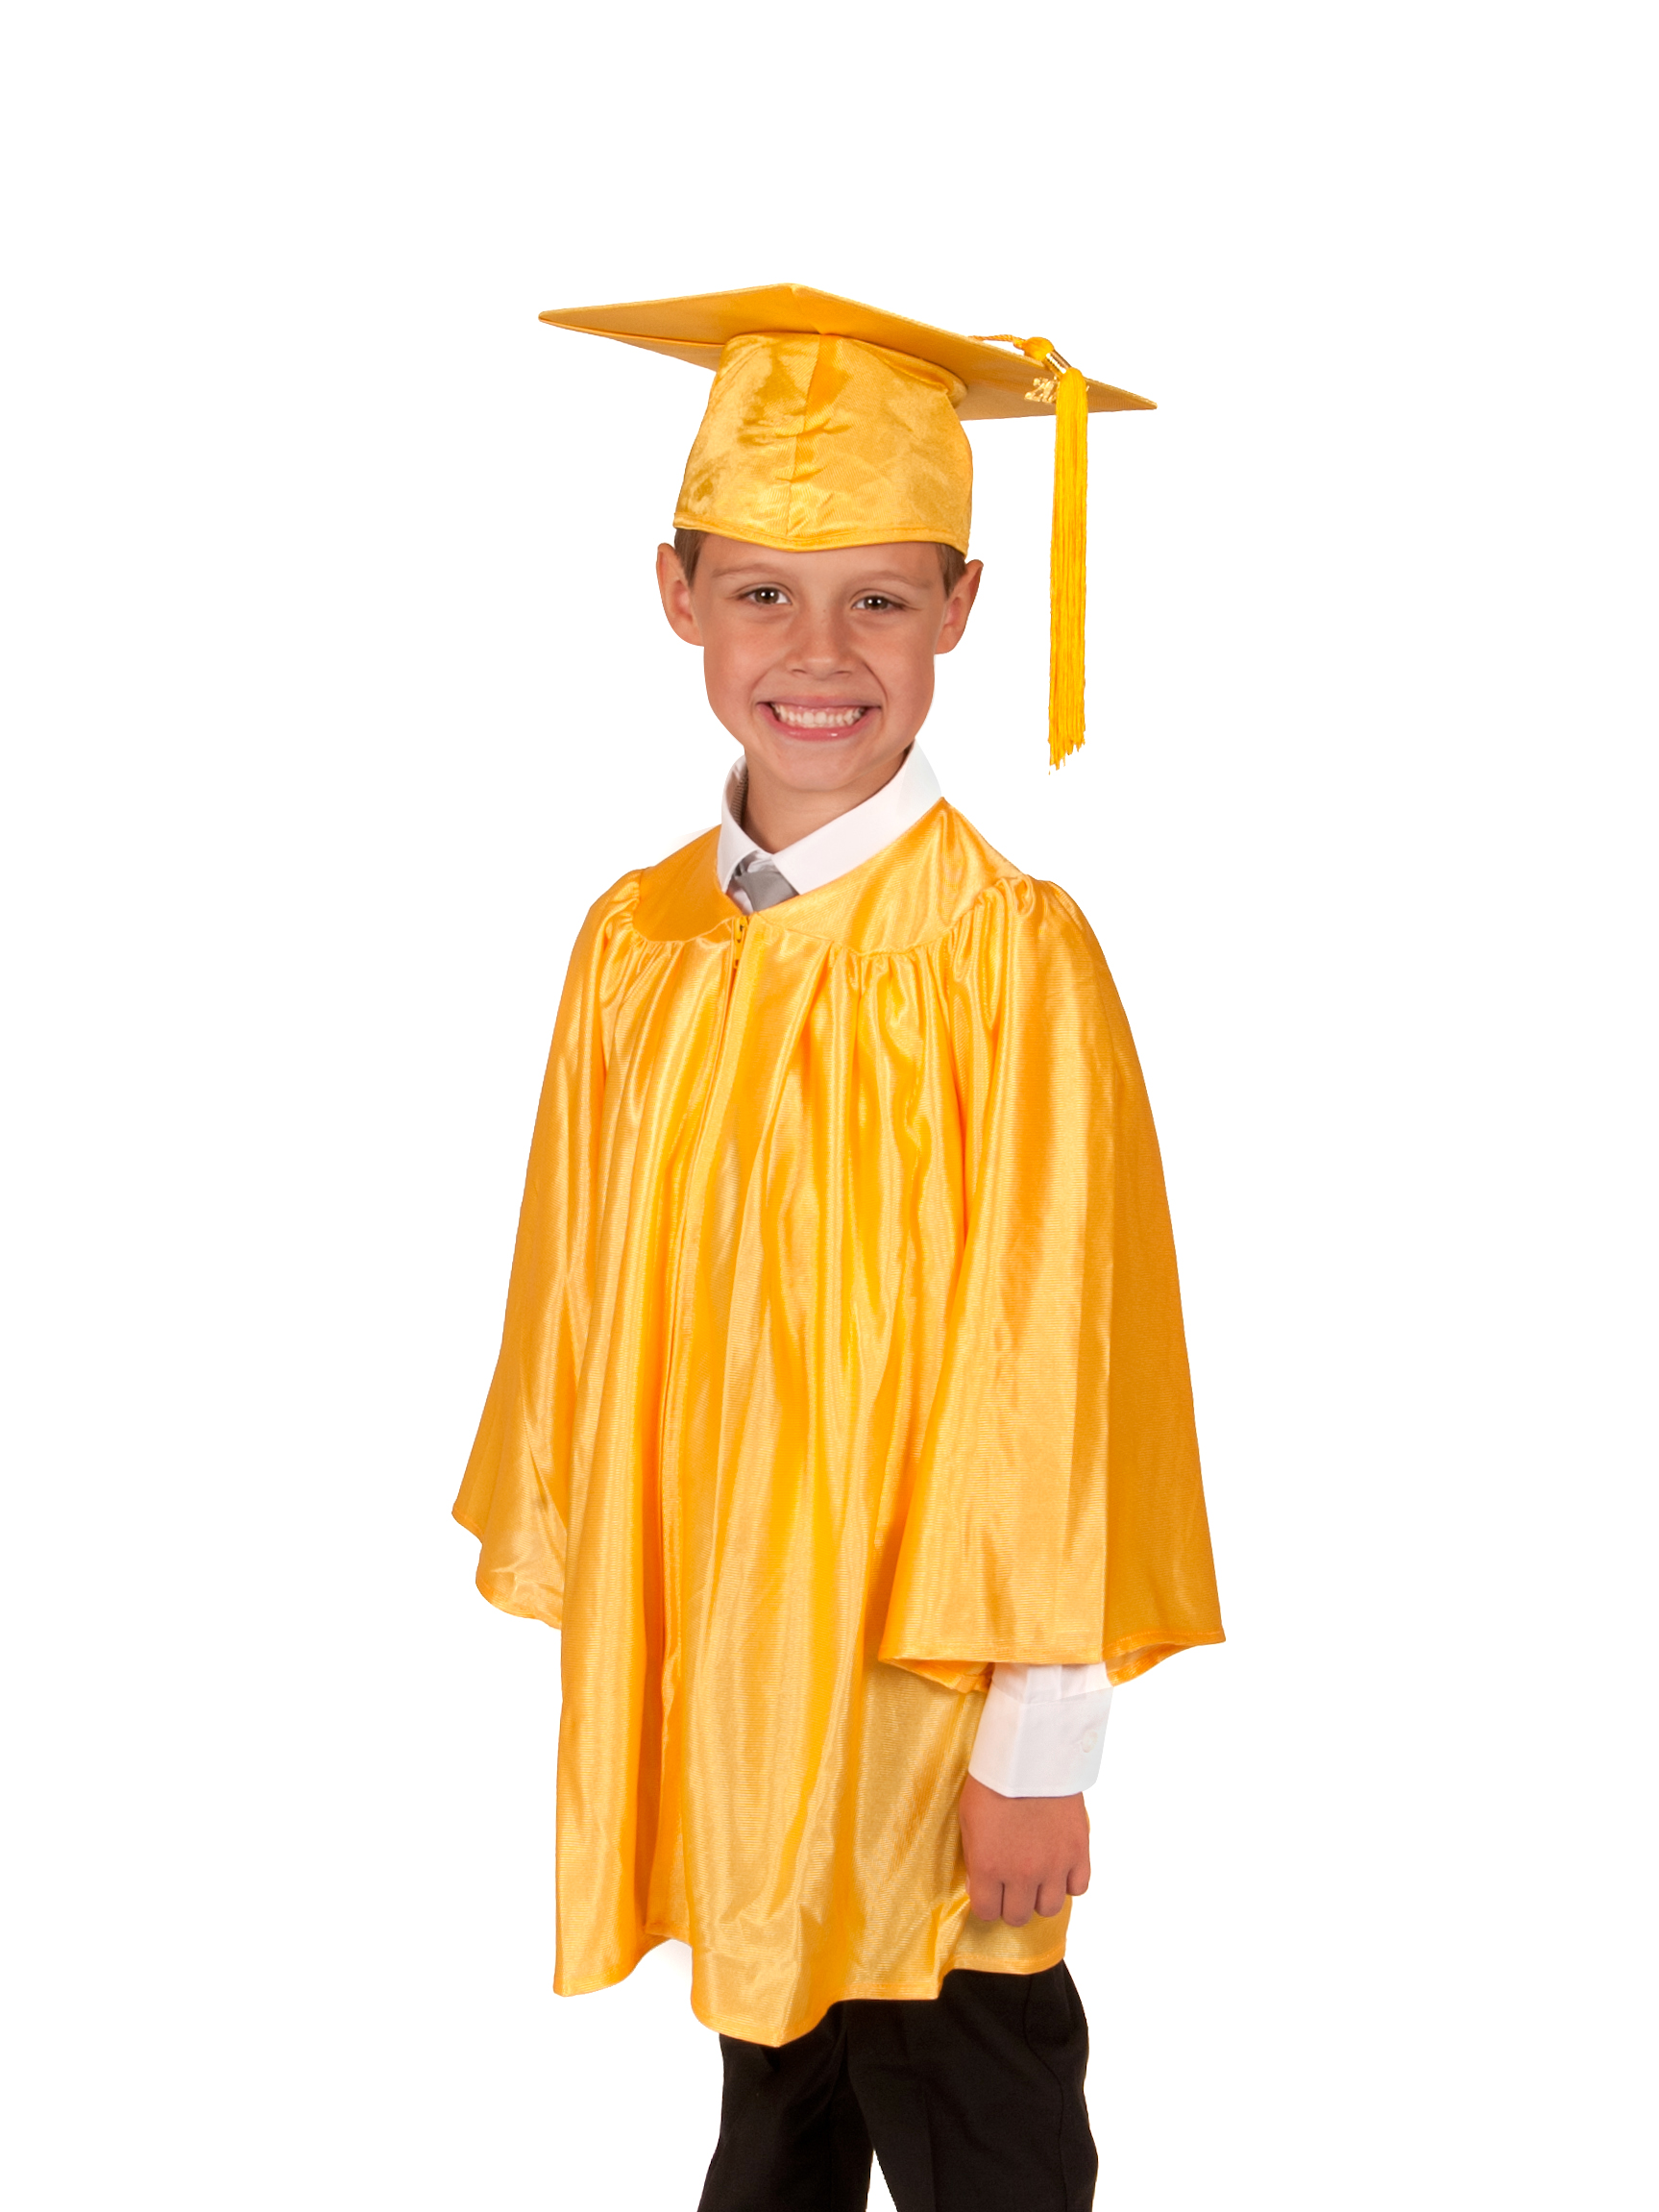 Shiny Graduation Cap for your Primary School Graduation Ceremony.